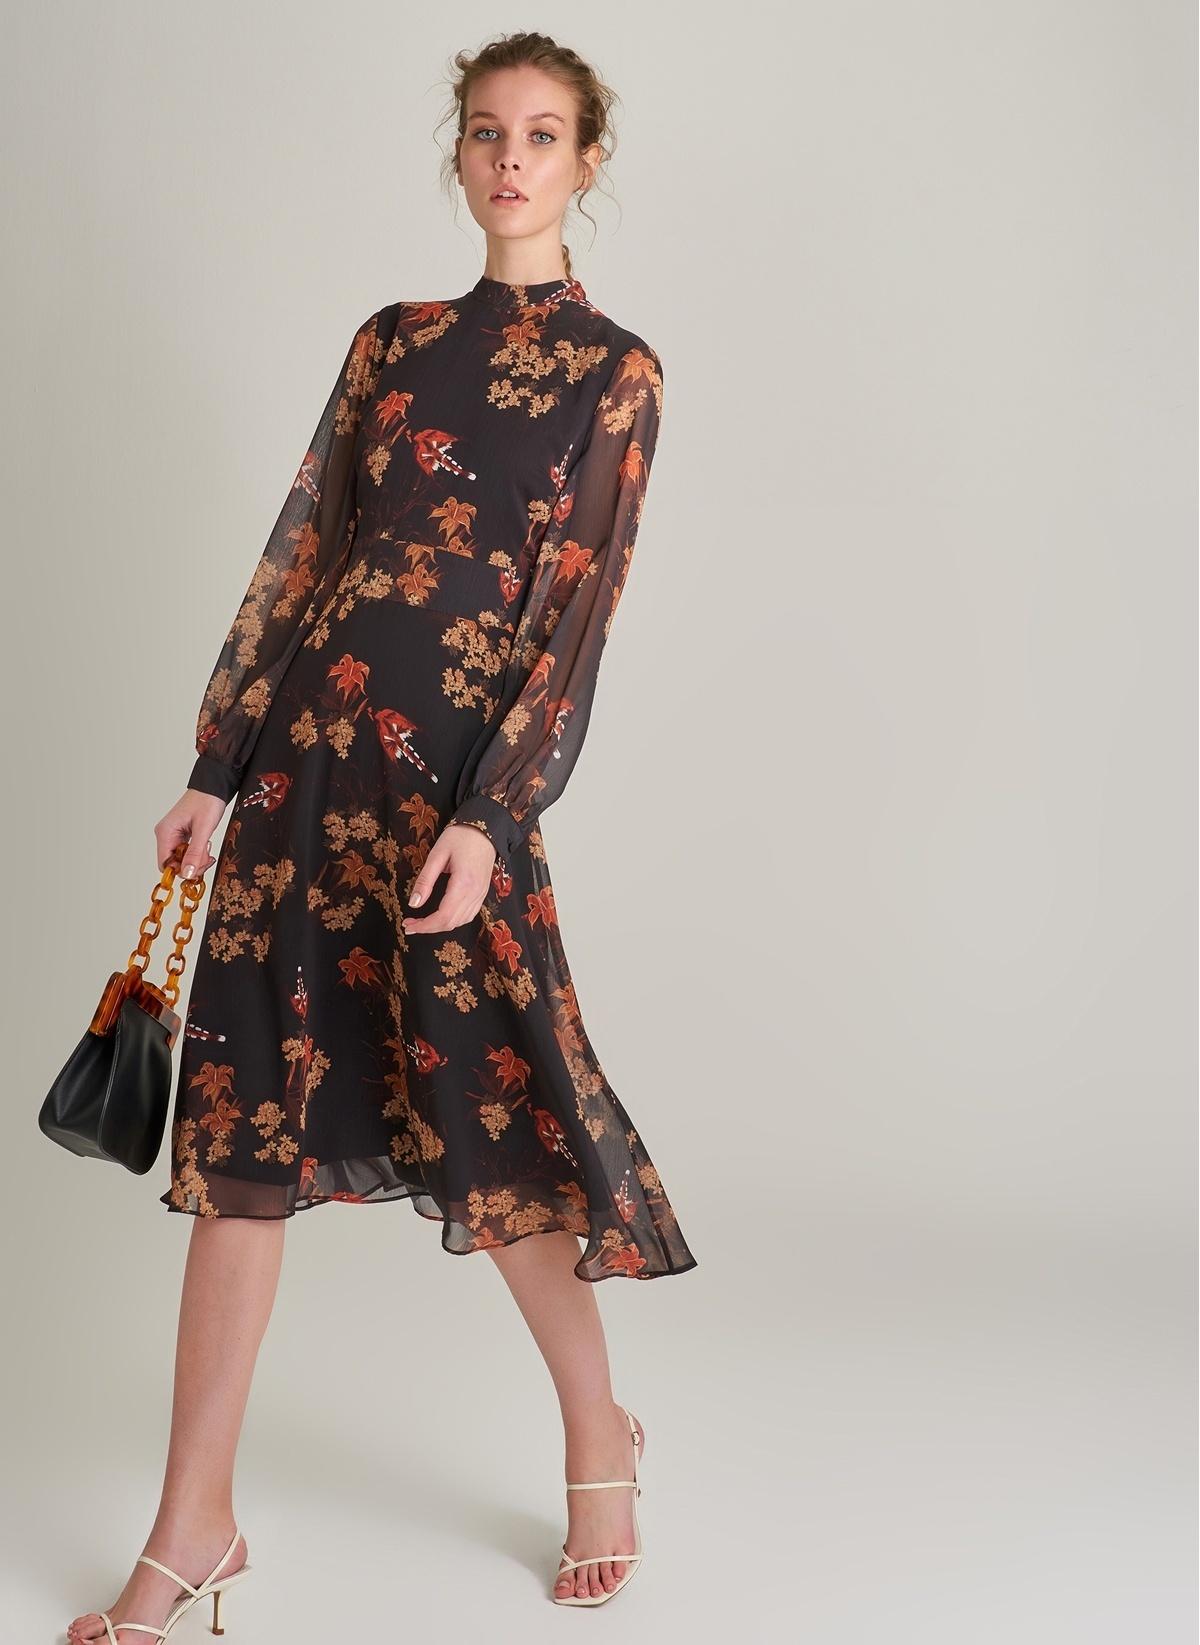 e944e2f02a89e Ng Style Kadın Çiçek Desenli Sırt Detaylı Elbise Siyah Desenli ...